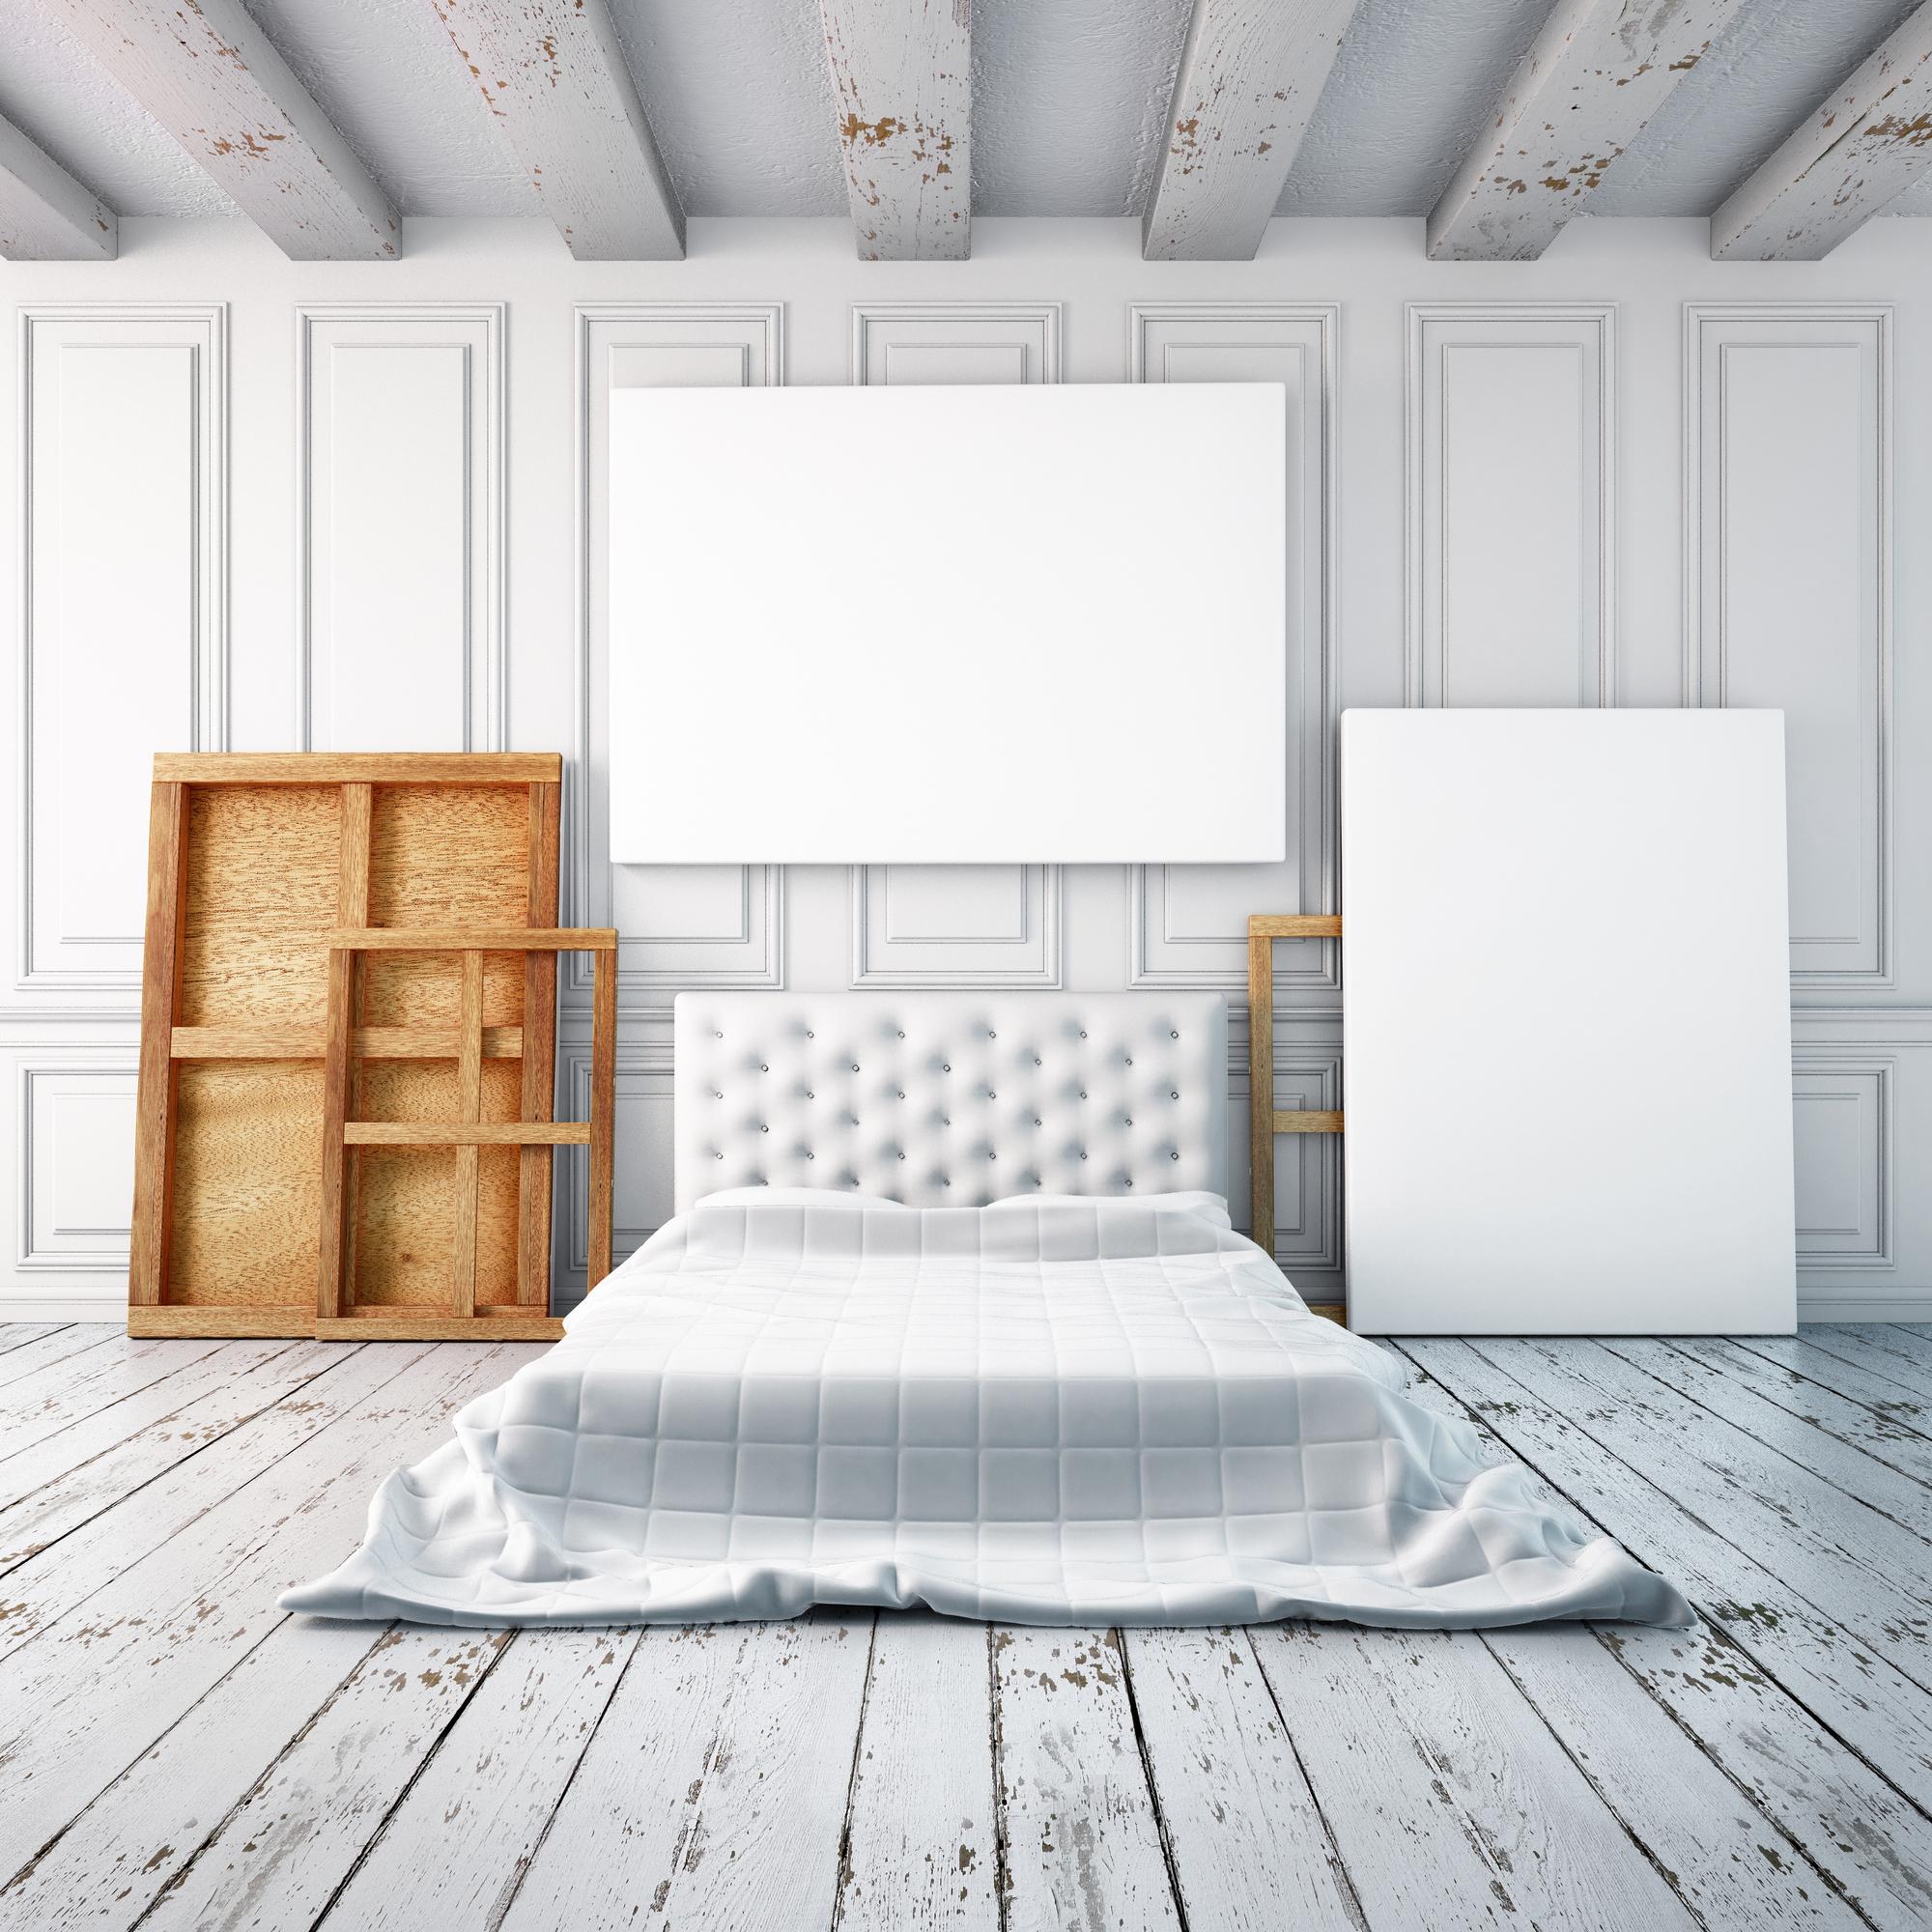 queen pad topper down mattress polyester bed fiber details hypoallergenic itm alternative